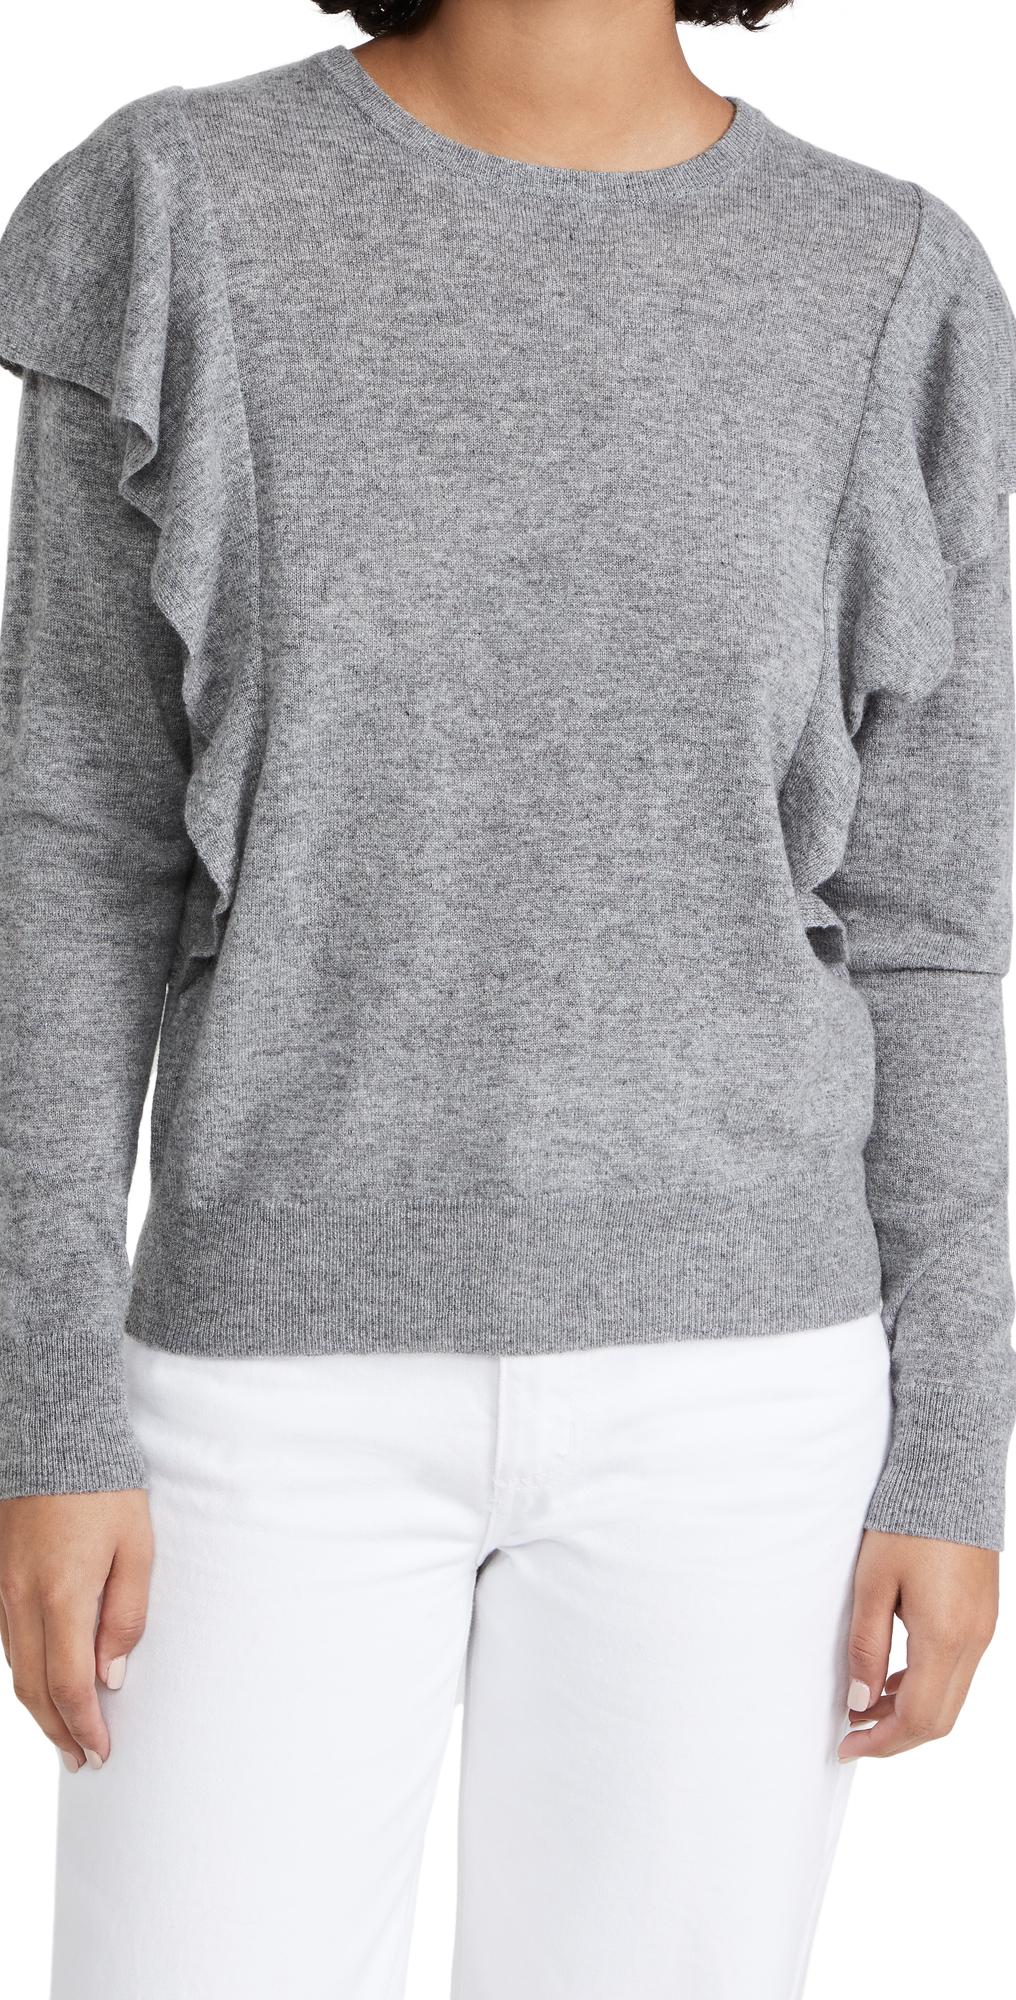 Double Ruffle Cashmere Crew Sweater